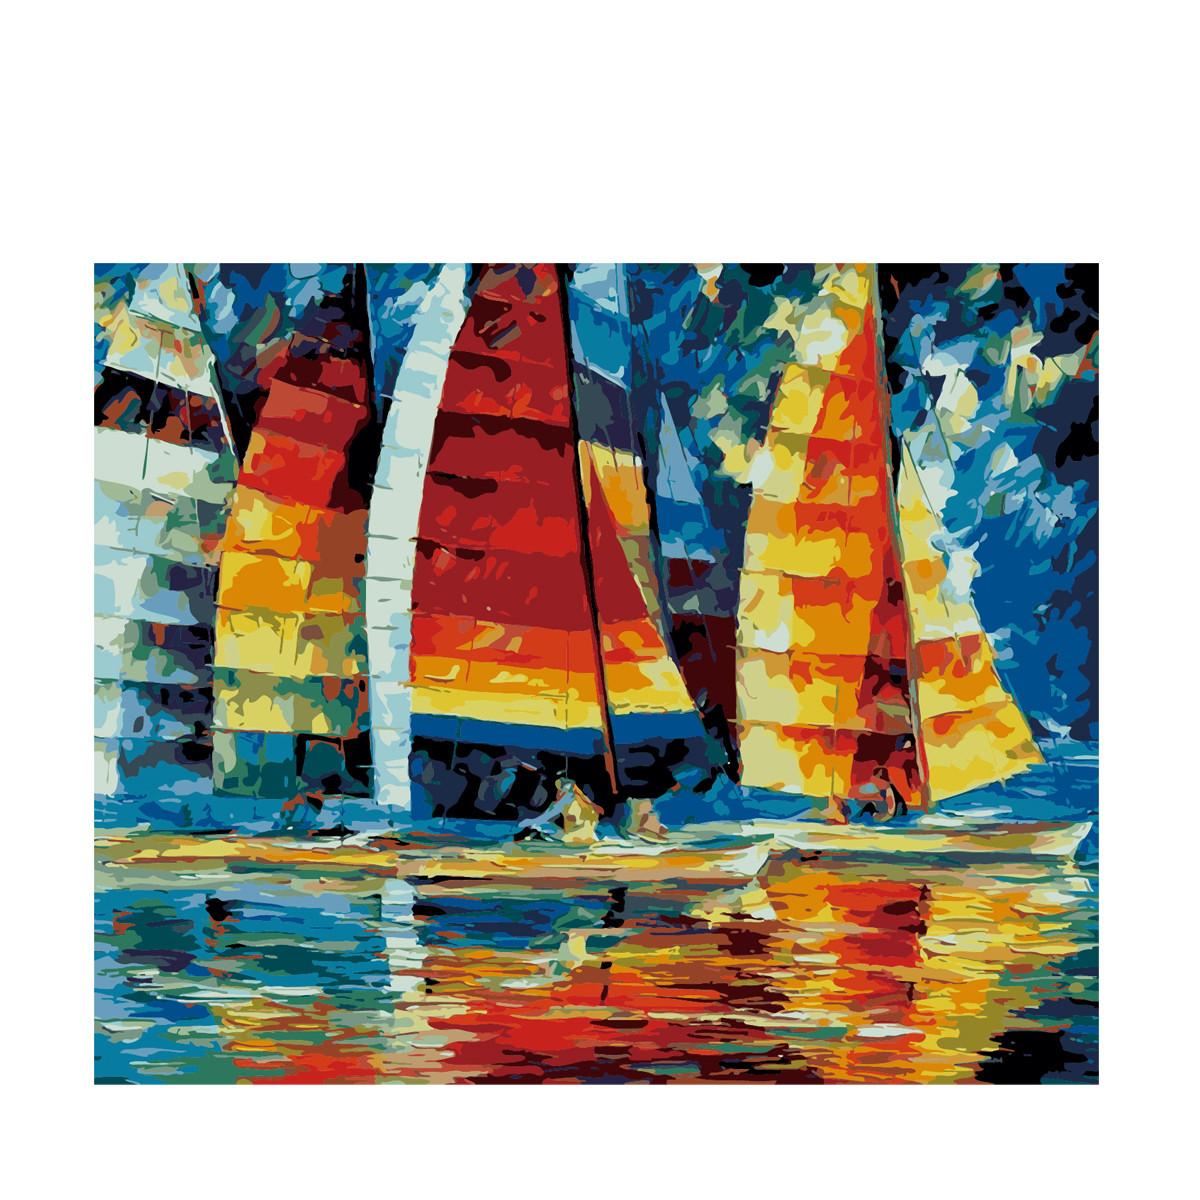 Картина по номерам Роспись на холсте Регата KH1015 40*50 см  (без коробки)